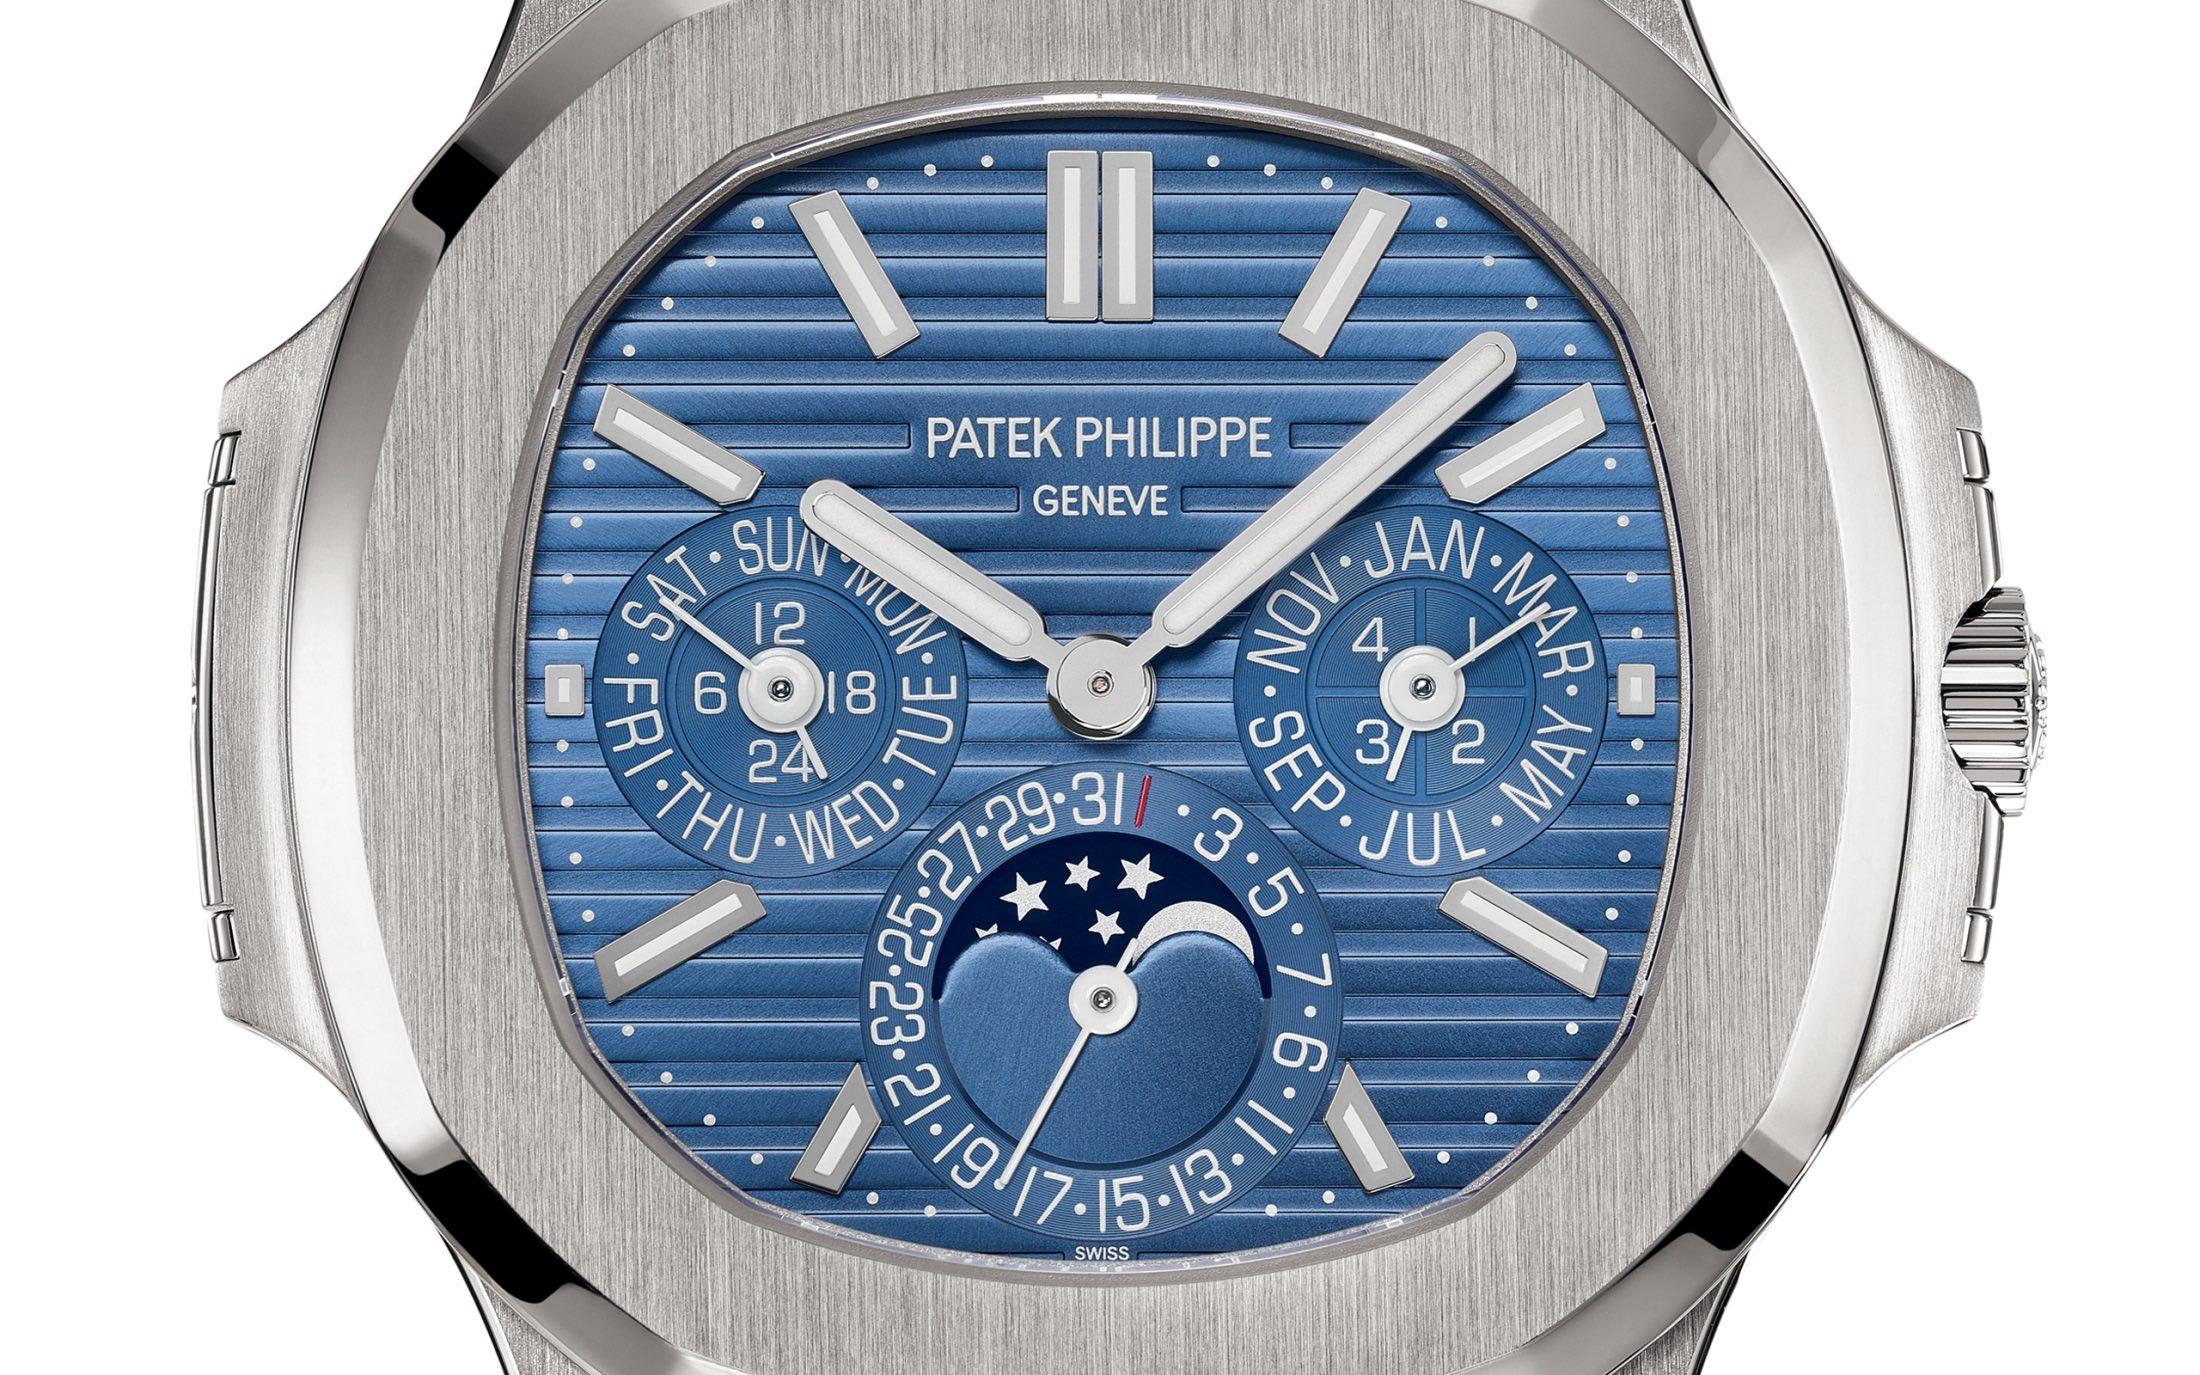 Patek Philippe Nautilus Perpetual Calendar 5740G - Baselworld 2018